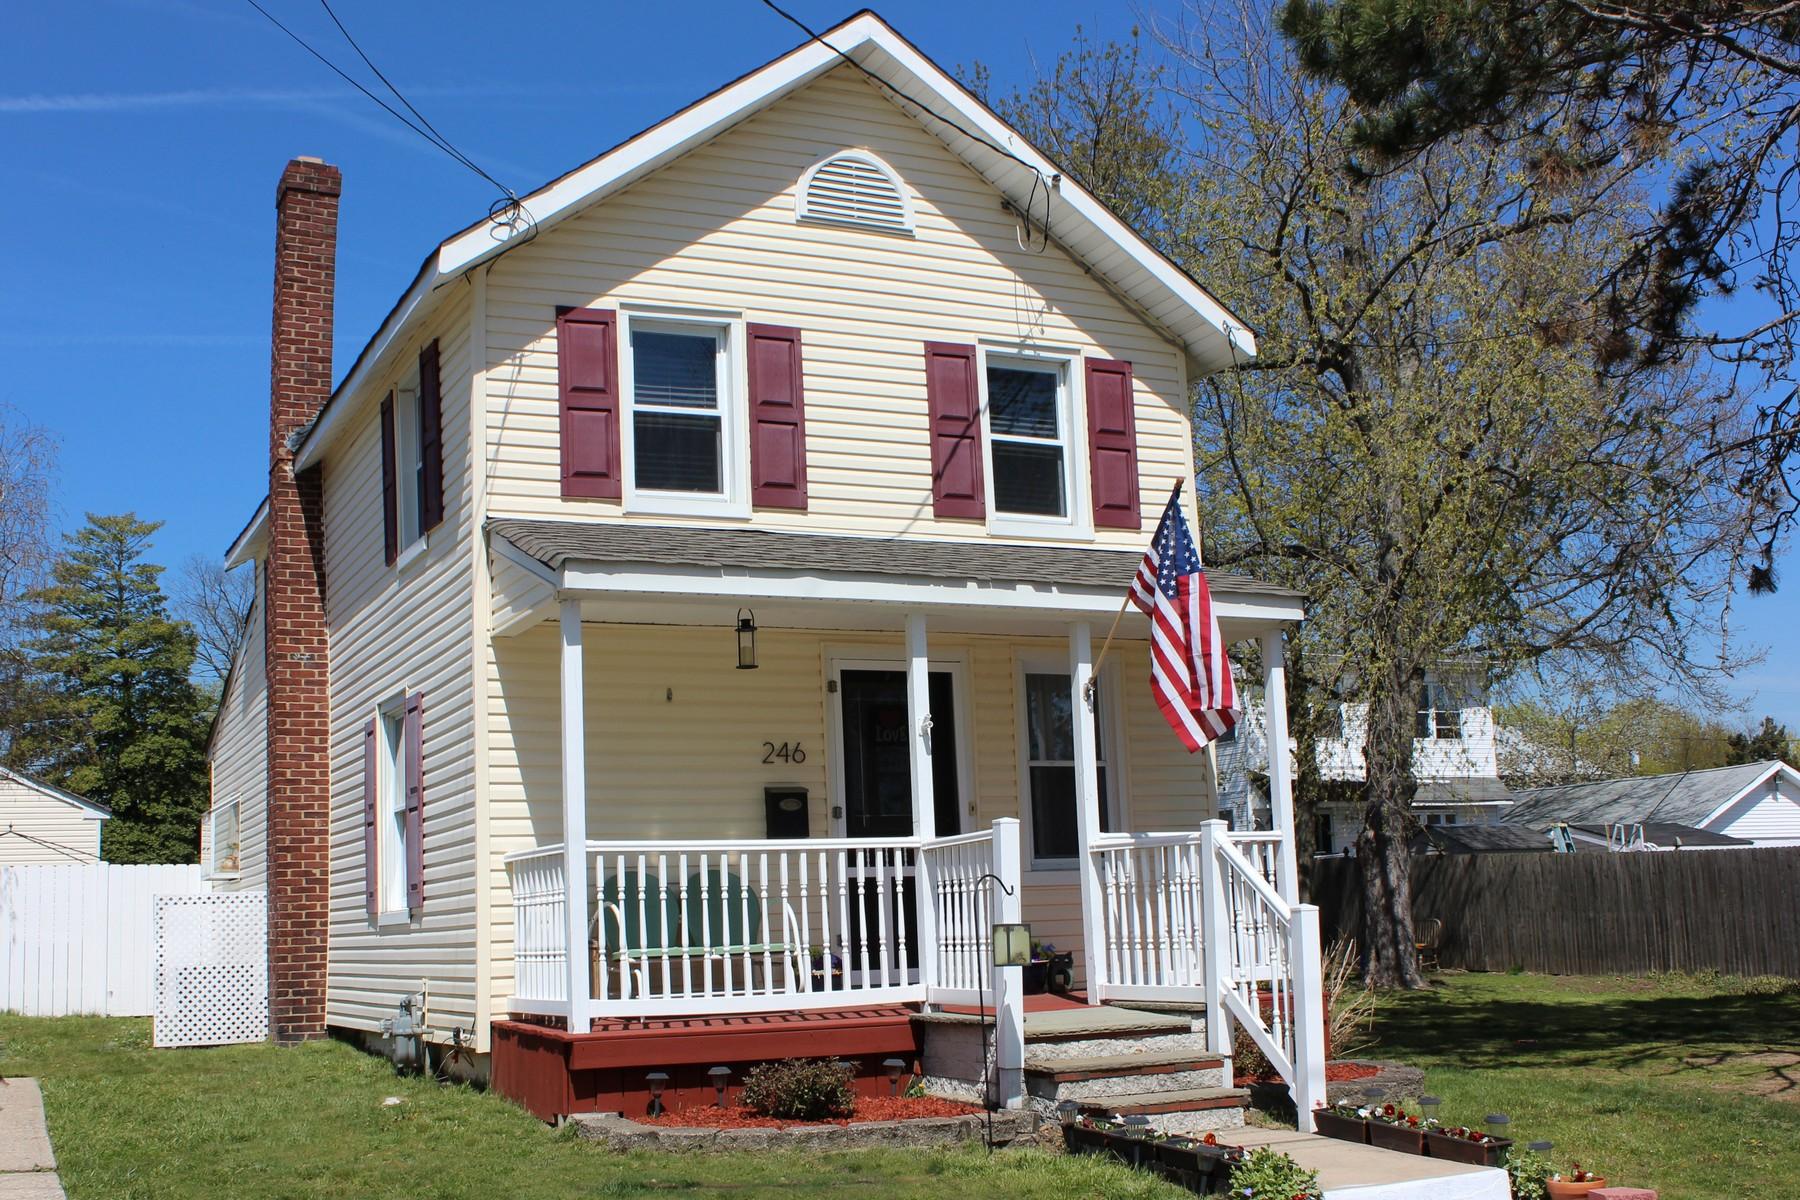 独户住宅 为 销售 在 In-town Charming Colonial 246 Jackson Street Matawan, 新泽西州, 07747 美国